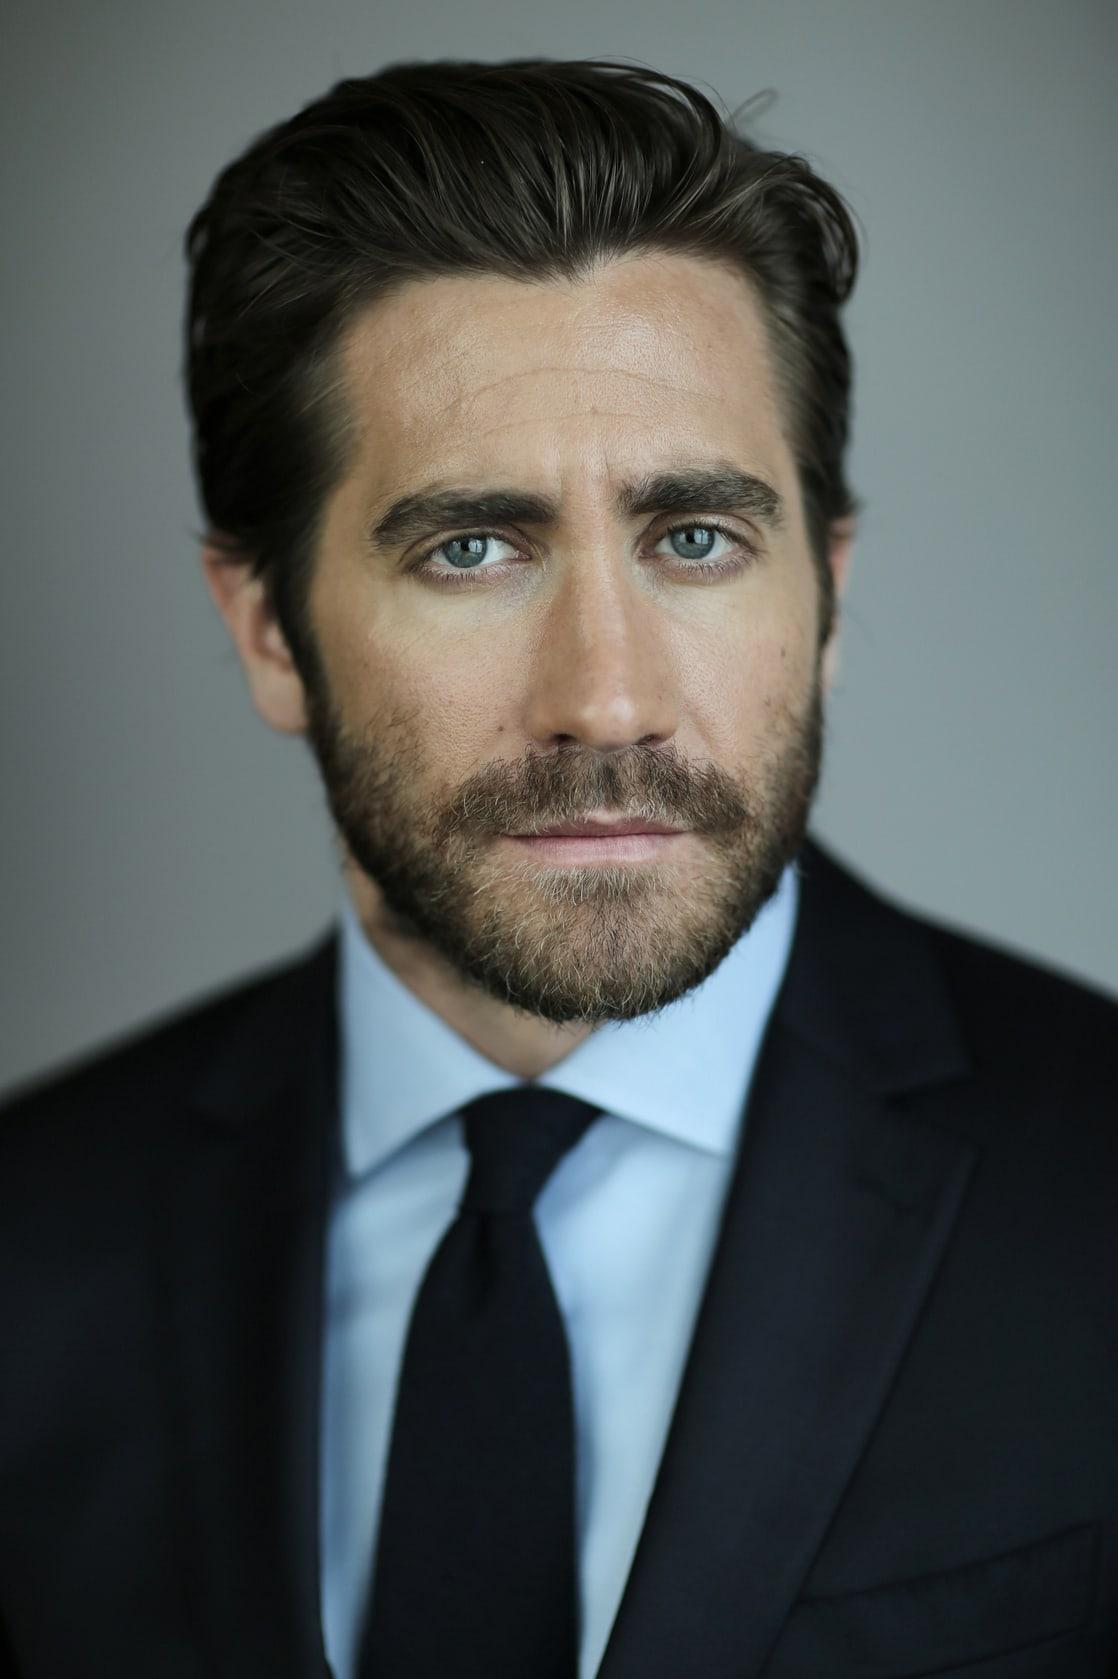 Picture of Jake Gyllenhaal Jake Gyllenhaal